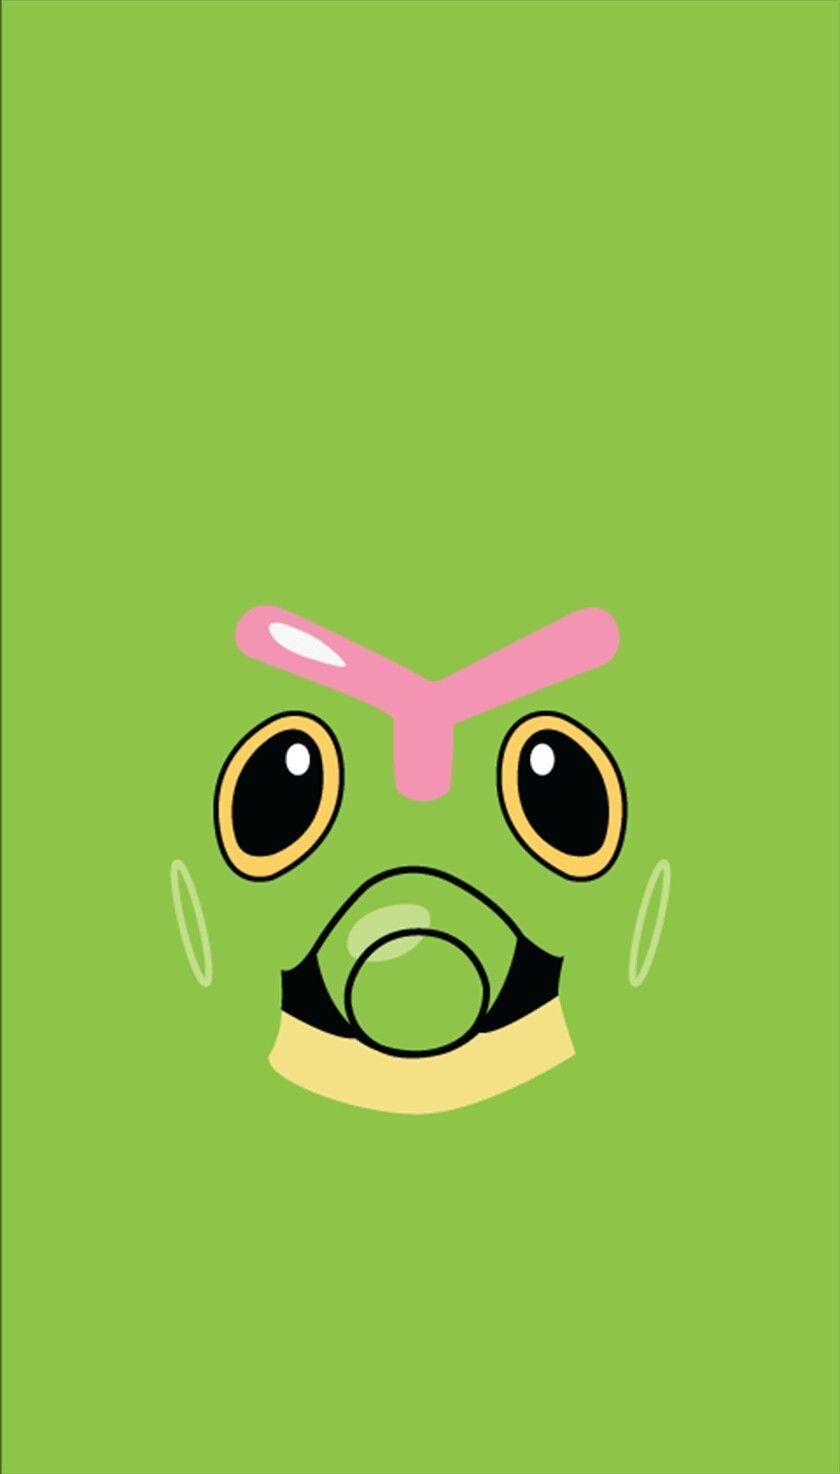 Caterpie wallpaper ❤ | Pokémon (ノ◕ヮ◕)ノ*:・゚✧ | Pinterest …